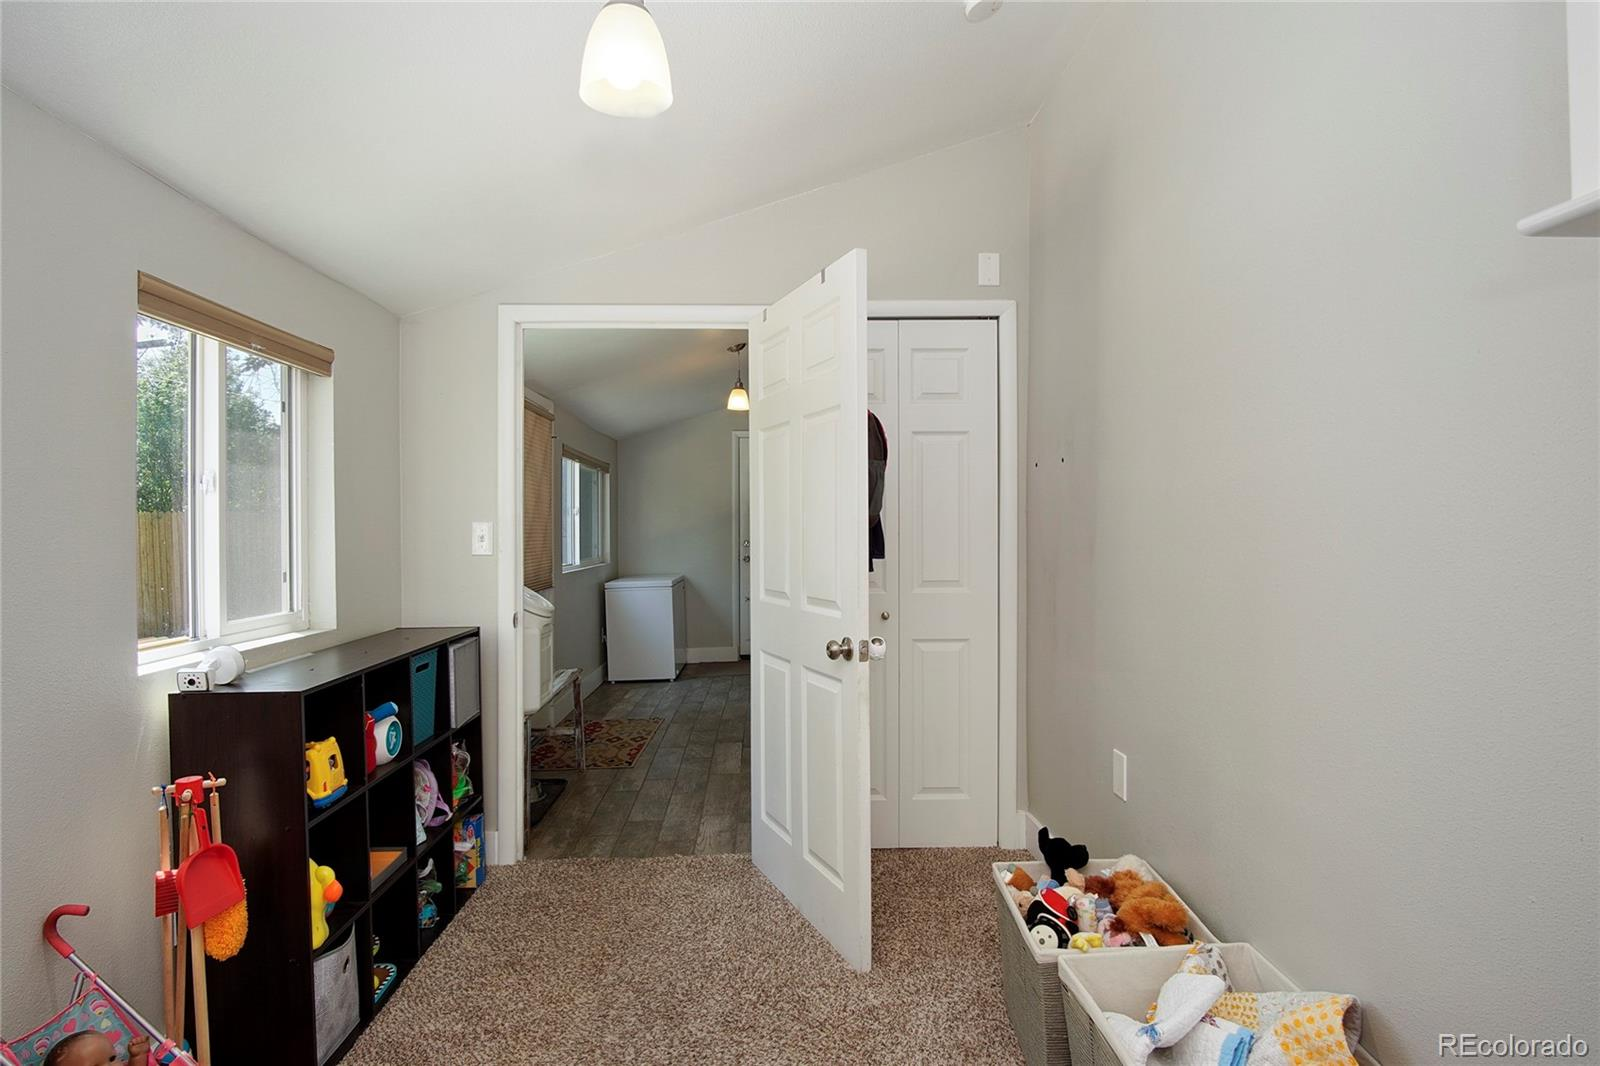 MLS# 2157977 - 16 - 1744 Verbena Street, Denver, CO 80220